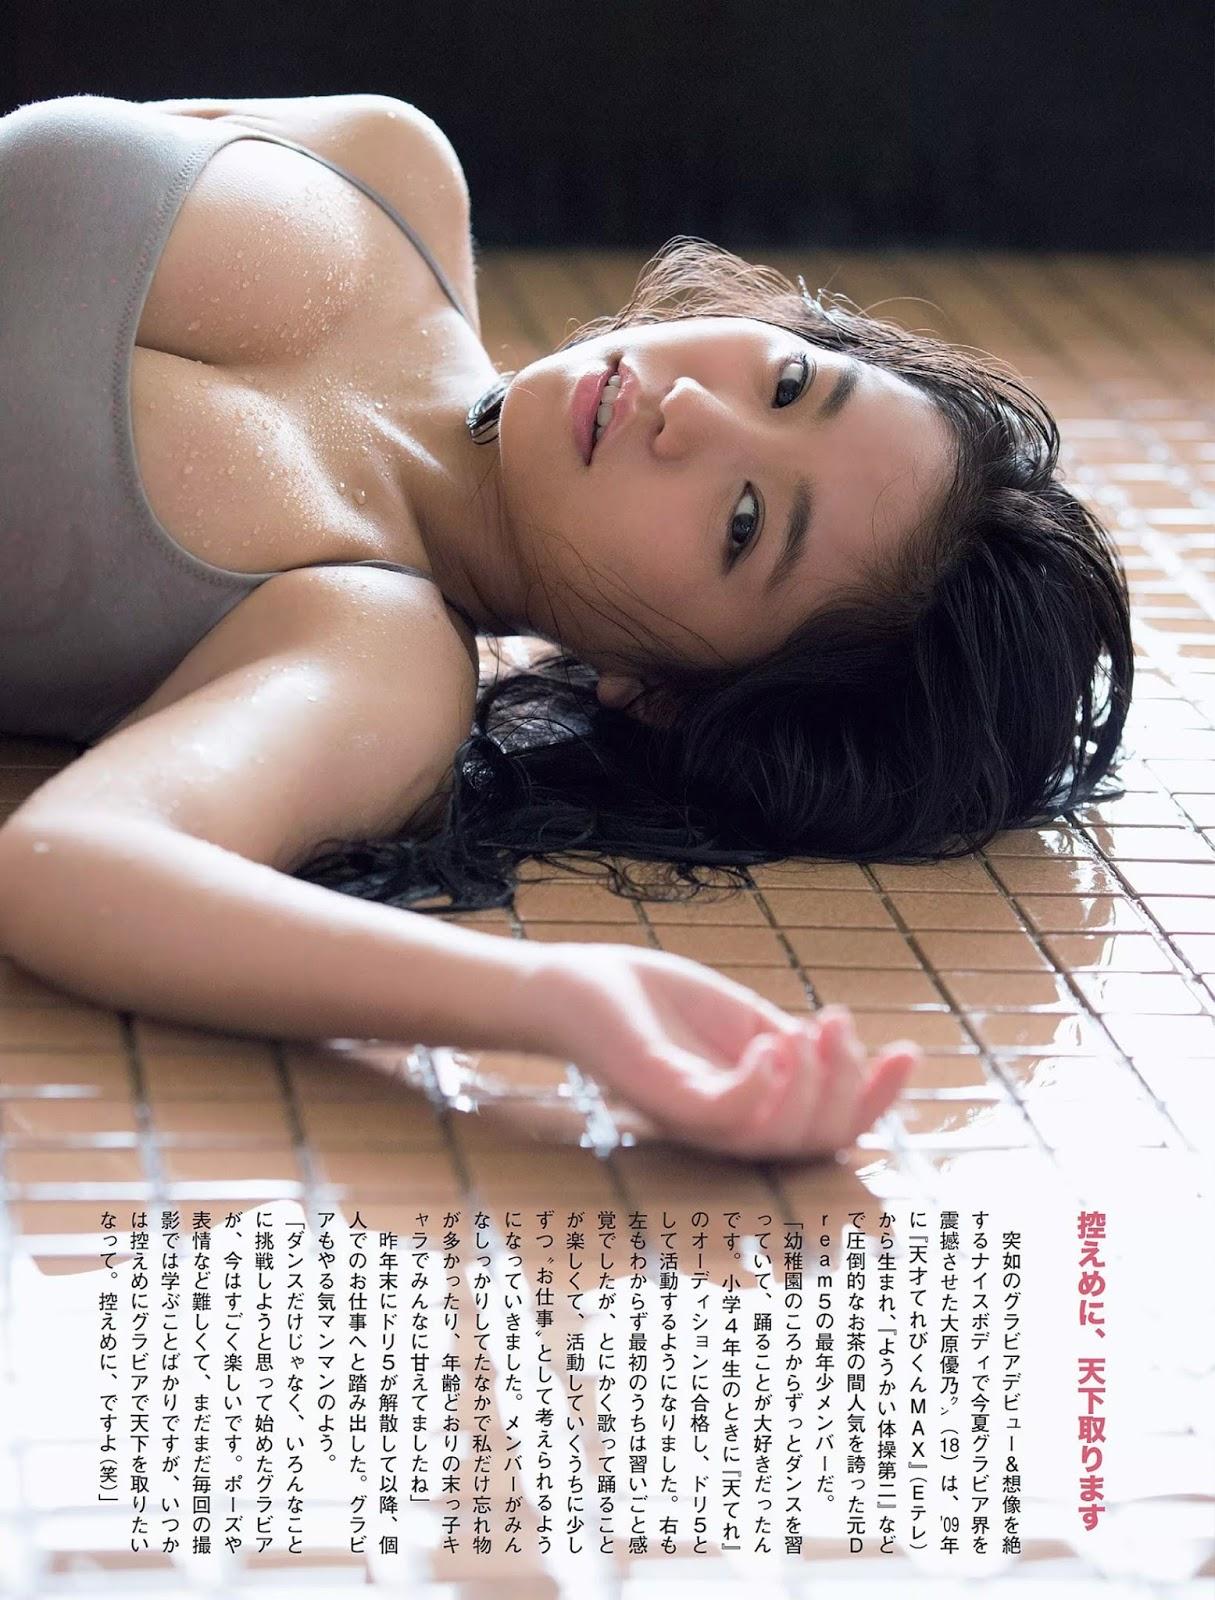 Yuno Ohara 大原優乃, FLASH 電子版 2017.11.28 (フラッシュ 2017年11月28日号)